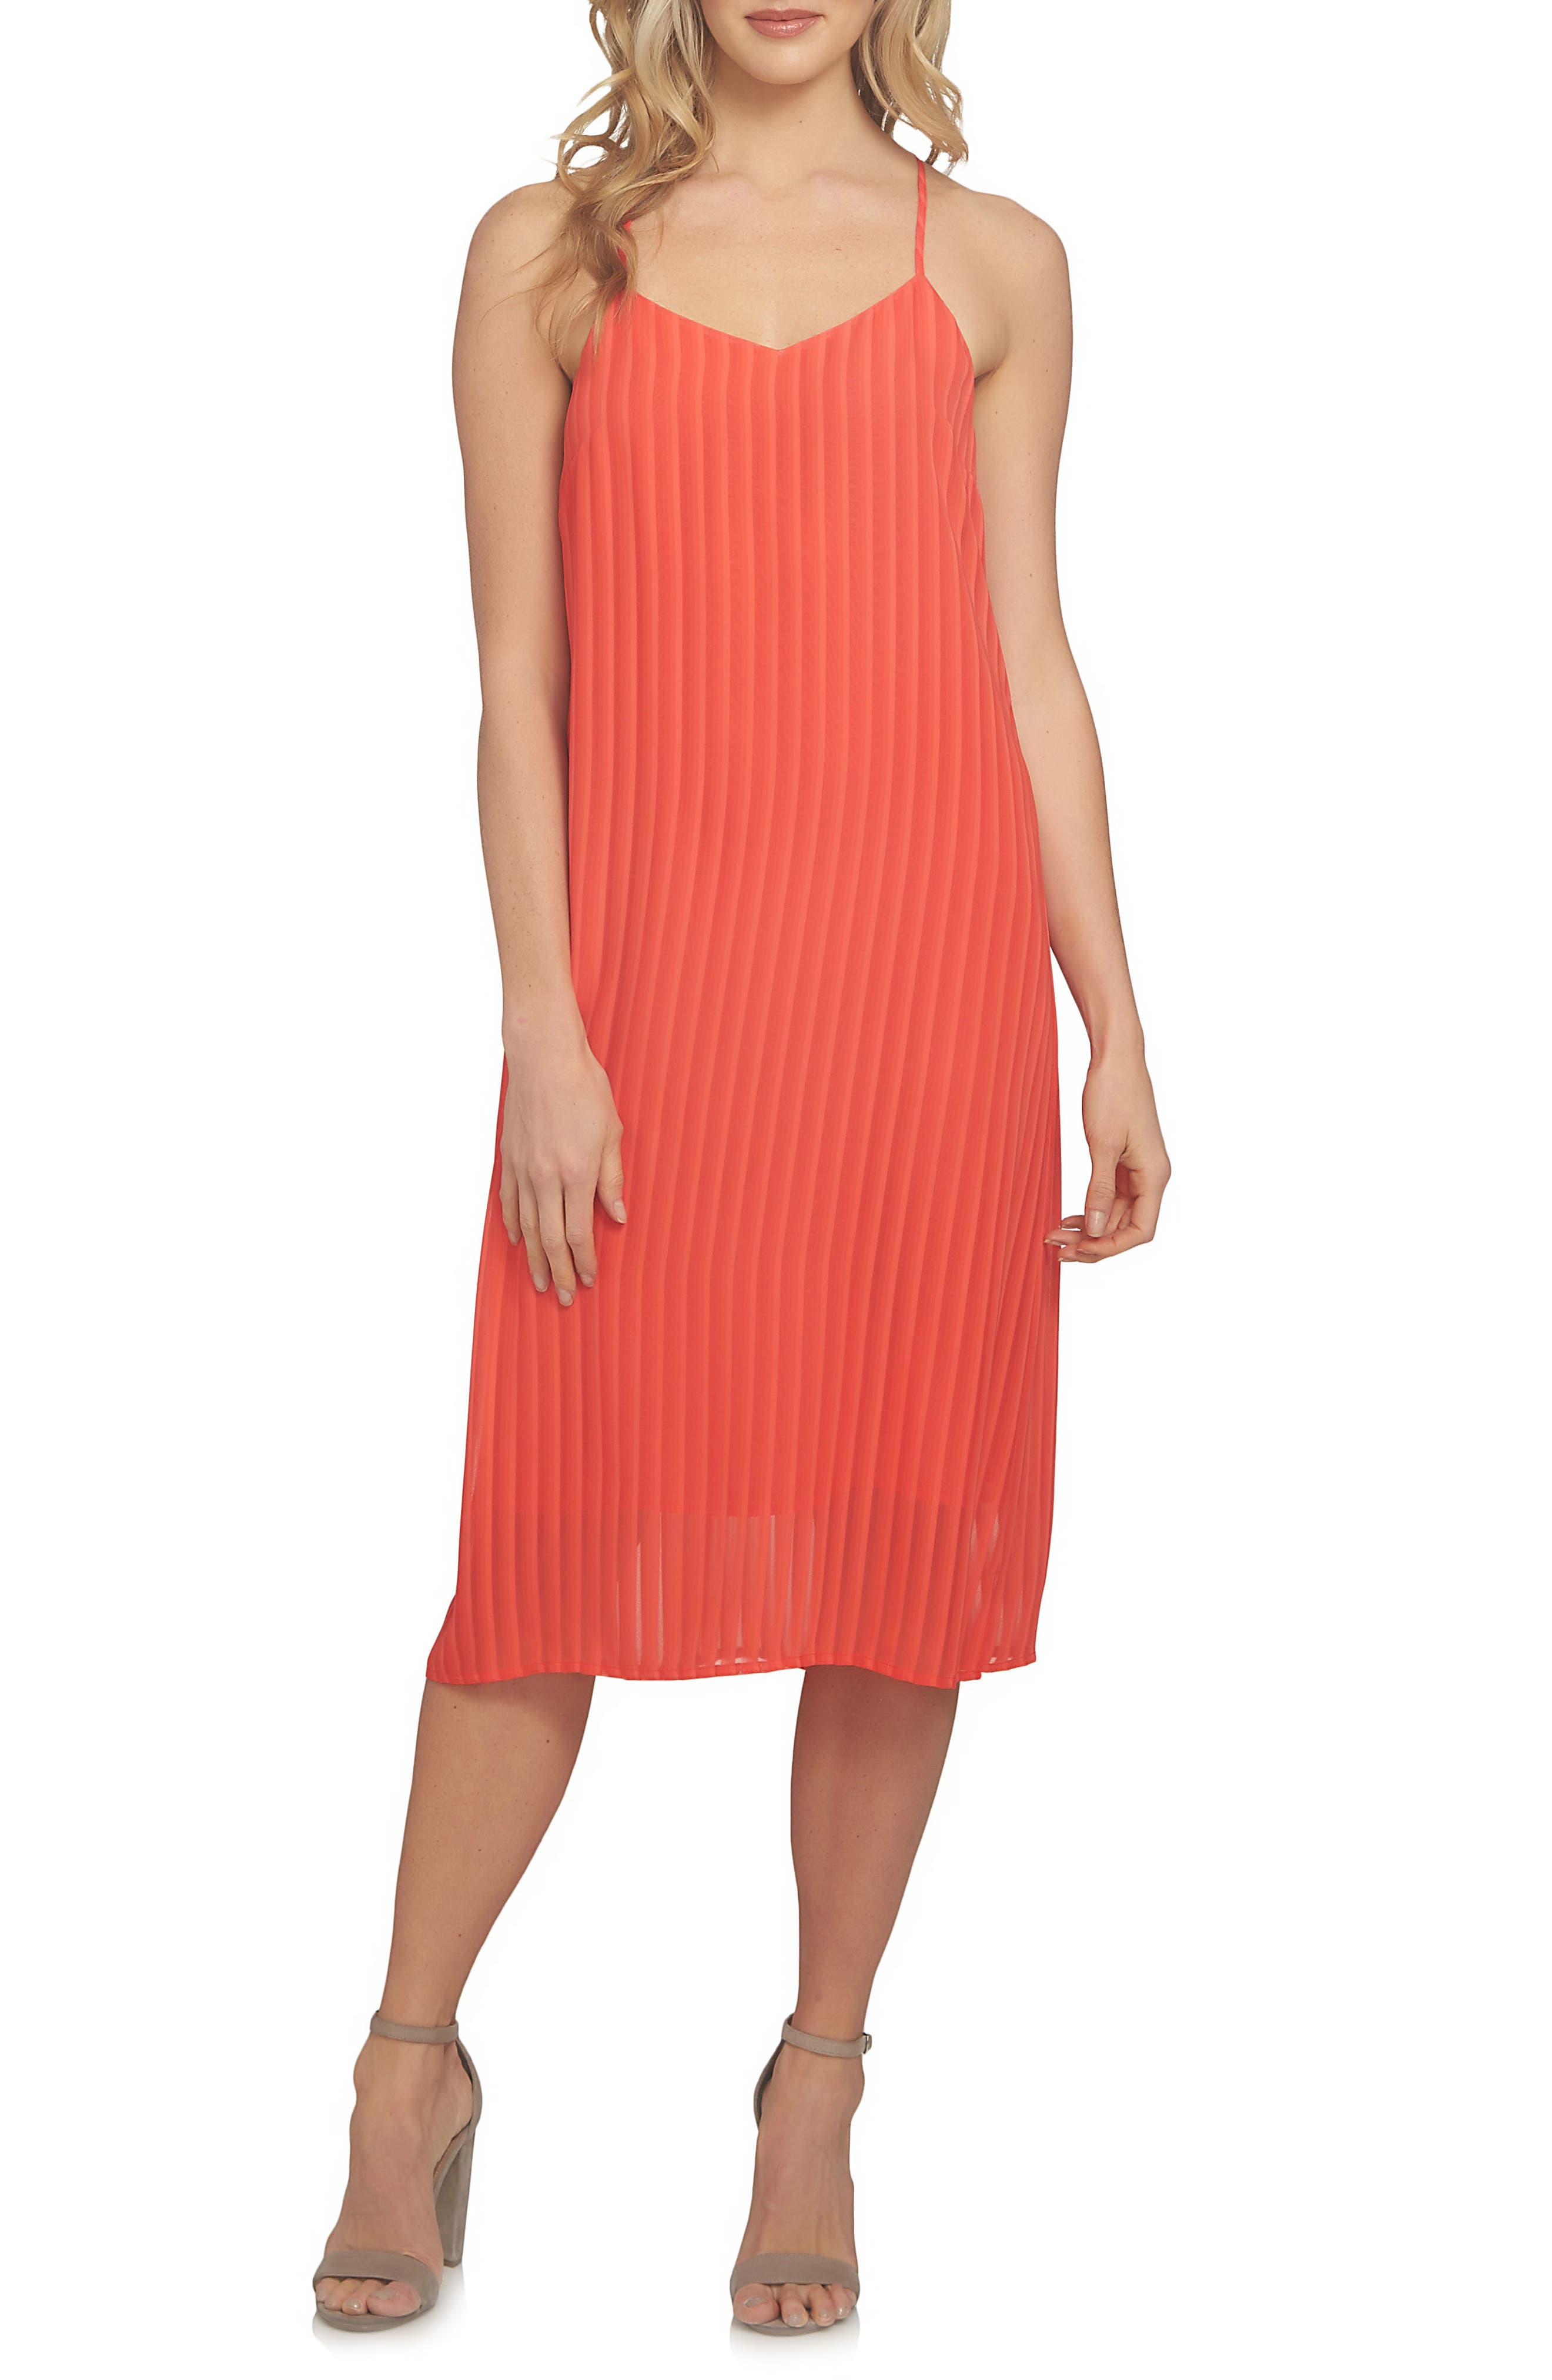 Lacey Chiffon Midi Dress,                         Main,                         color, 609